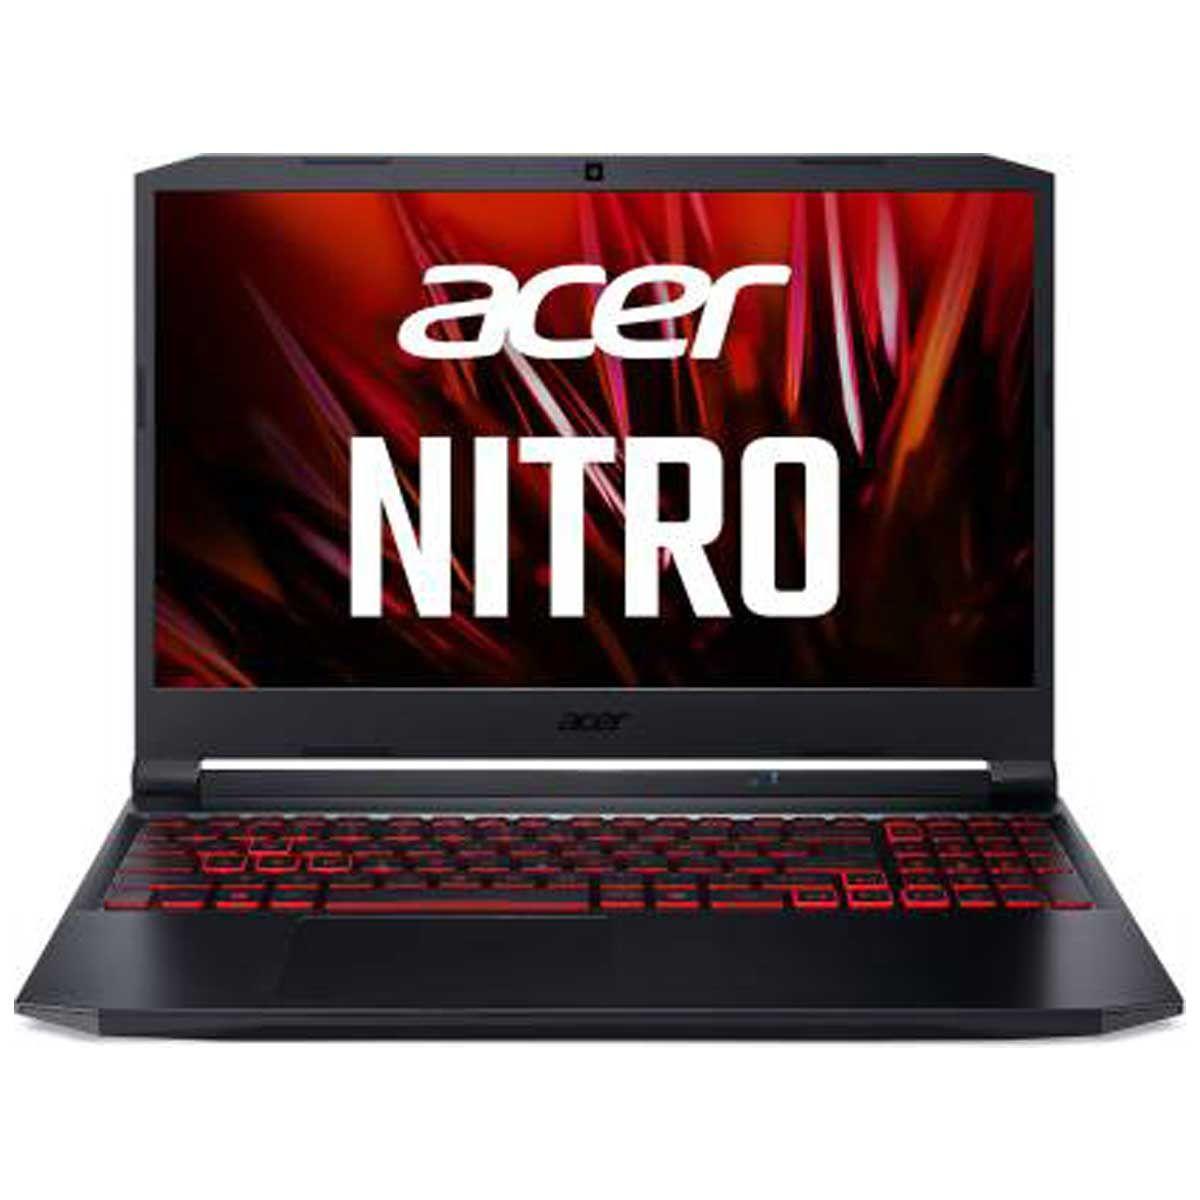 Acer NITRO 5 Ryzen 9 (2021)